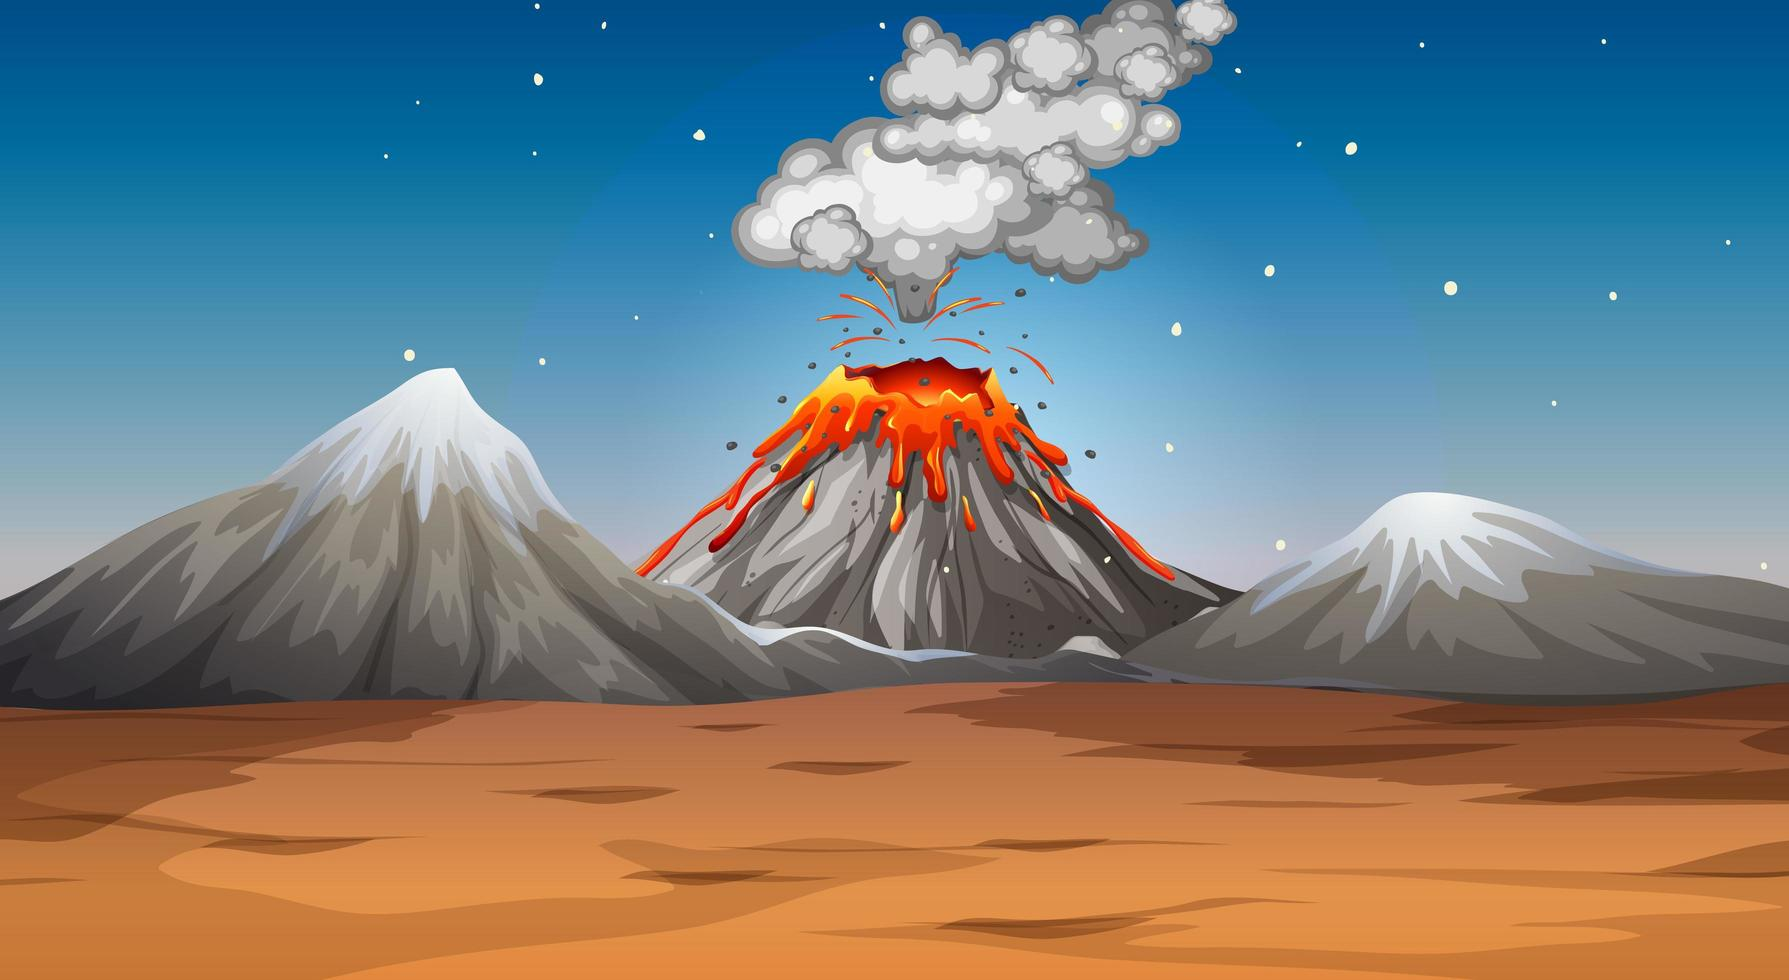 Volcano eruption in desert scene at night vector